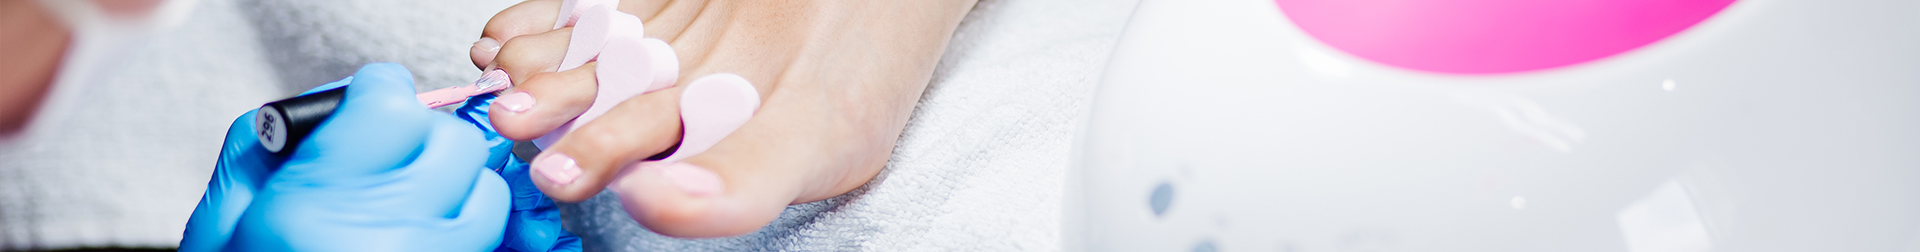 Skin Care Products   Buy Best Foot Care Kit - Pedicure Kit   AromaCraze